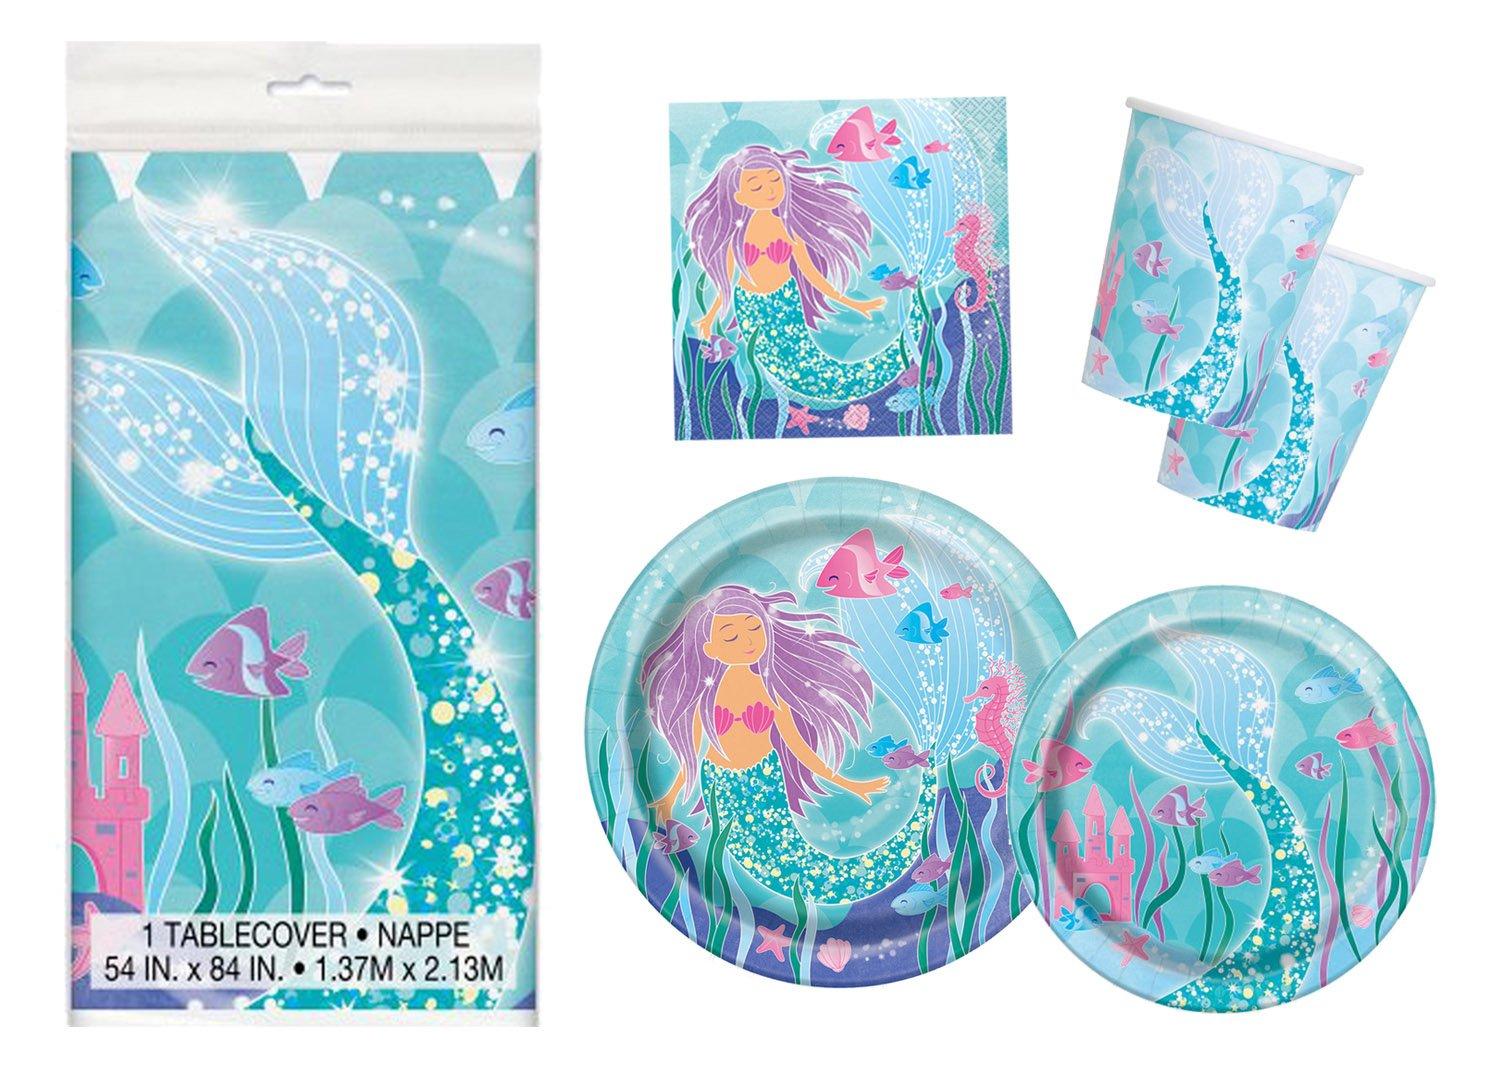 Mermaid Birthday Party Supplies Pack - Serves 16